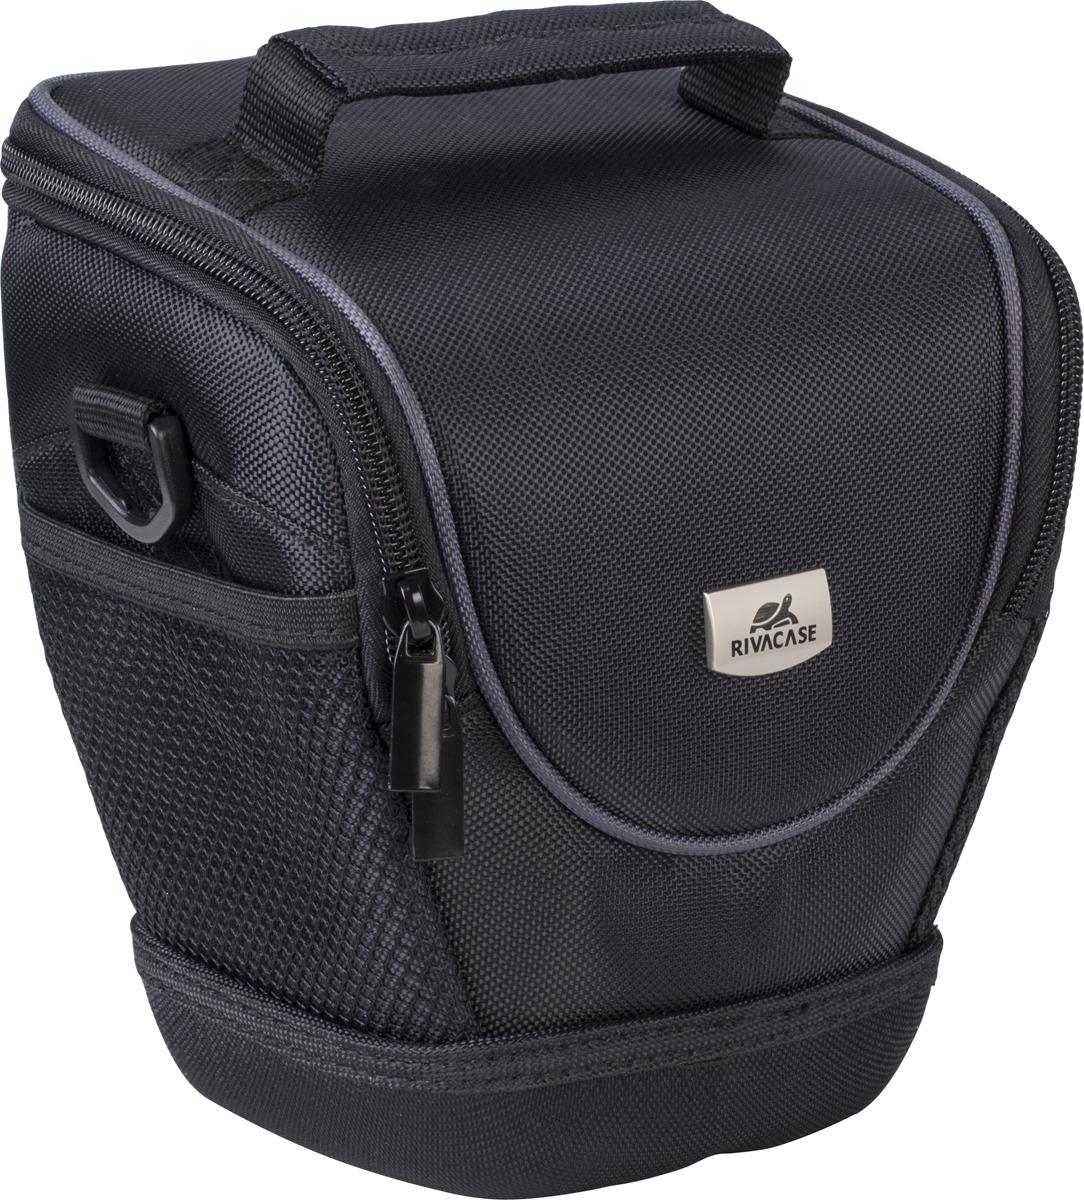 Сумка для фотоаппарата RivaCase 7205A-01 (PS) Digital Case Black rivacase 7630 slr case pro black сумка для зеркальной фотокамеры